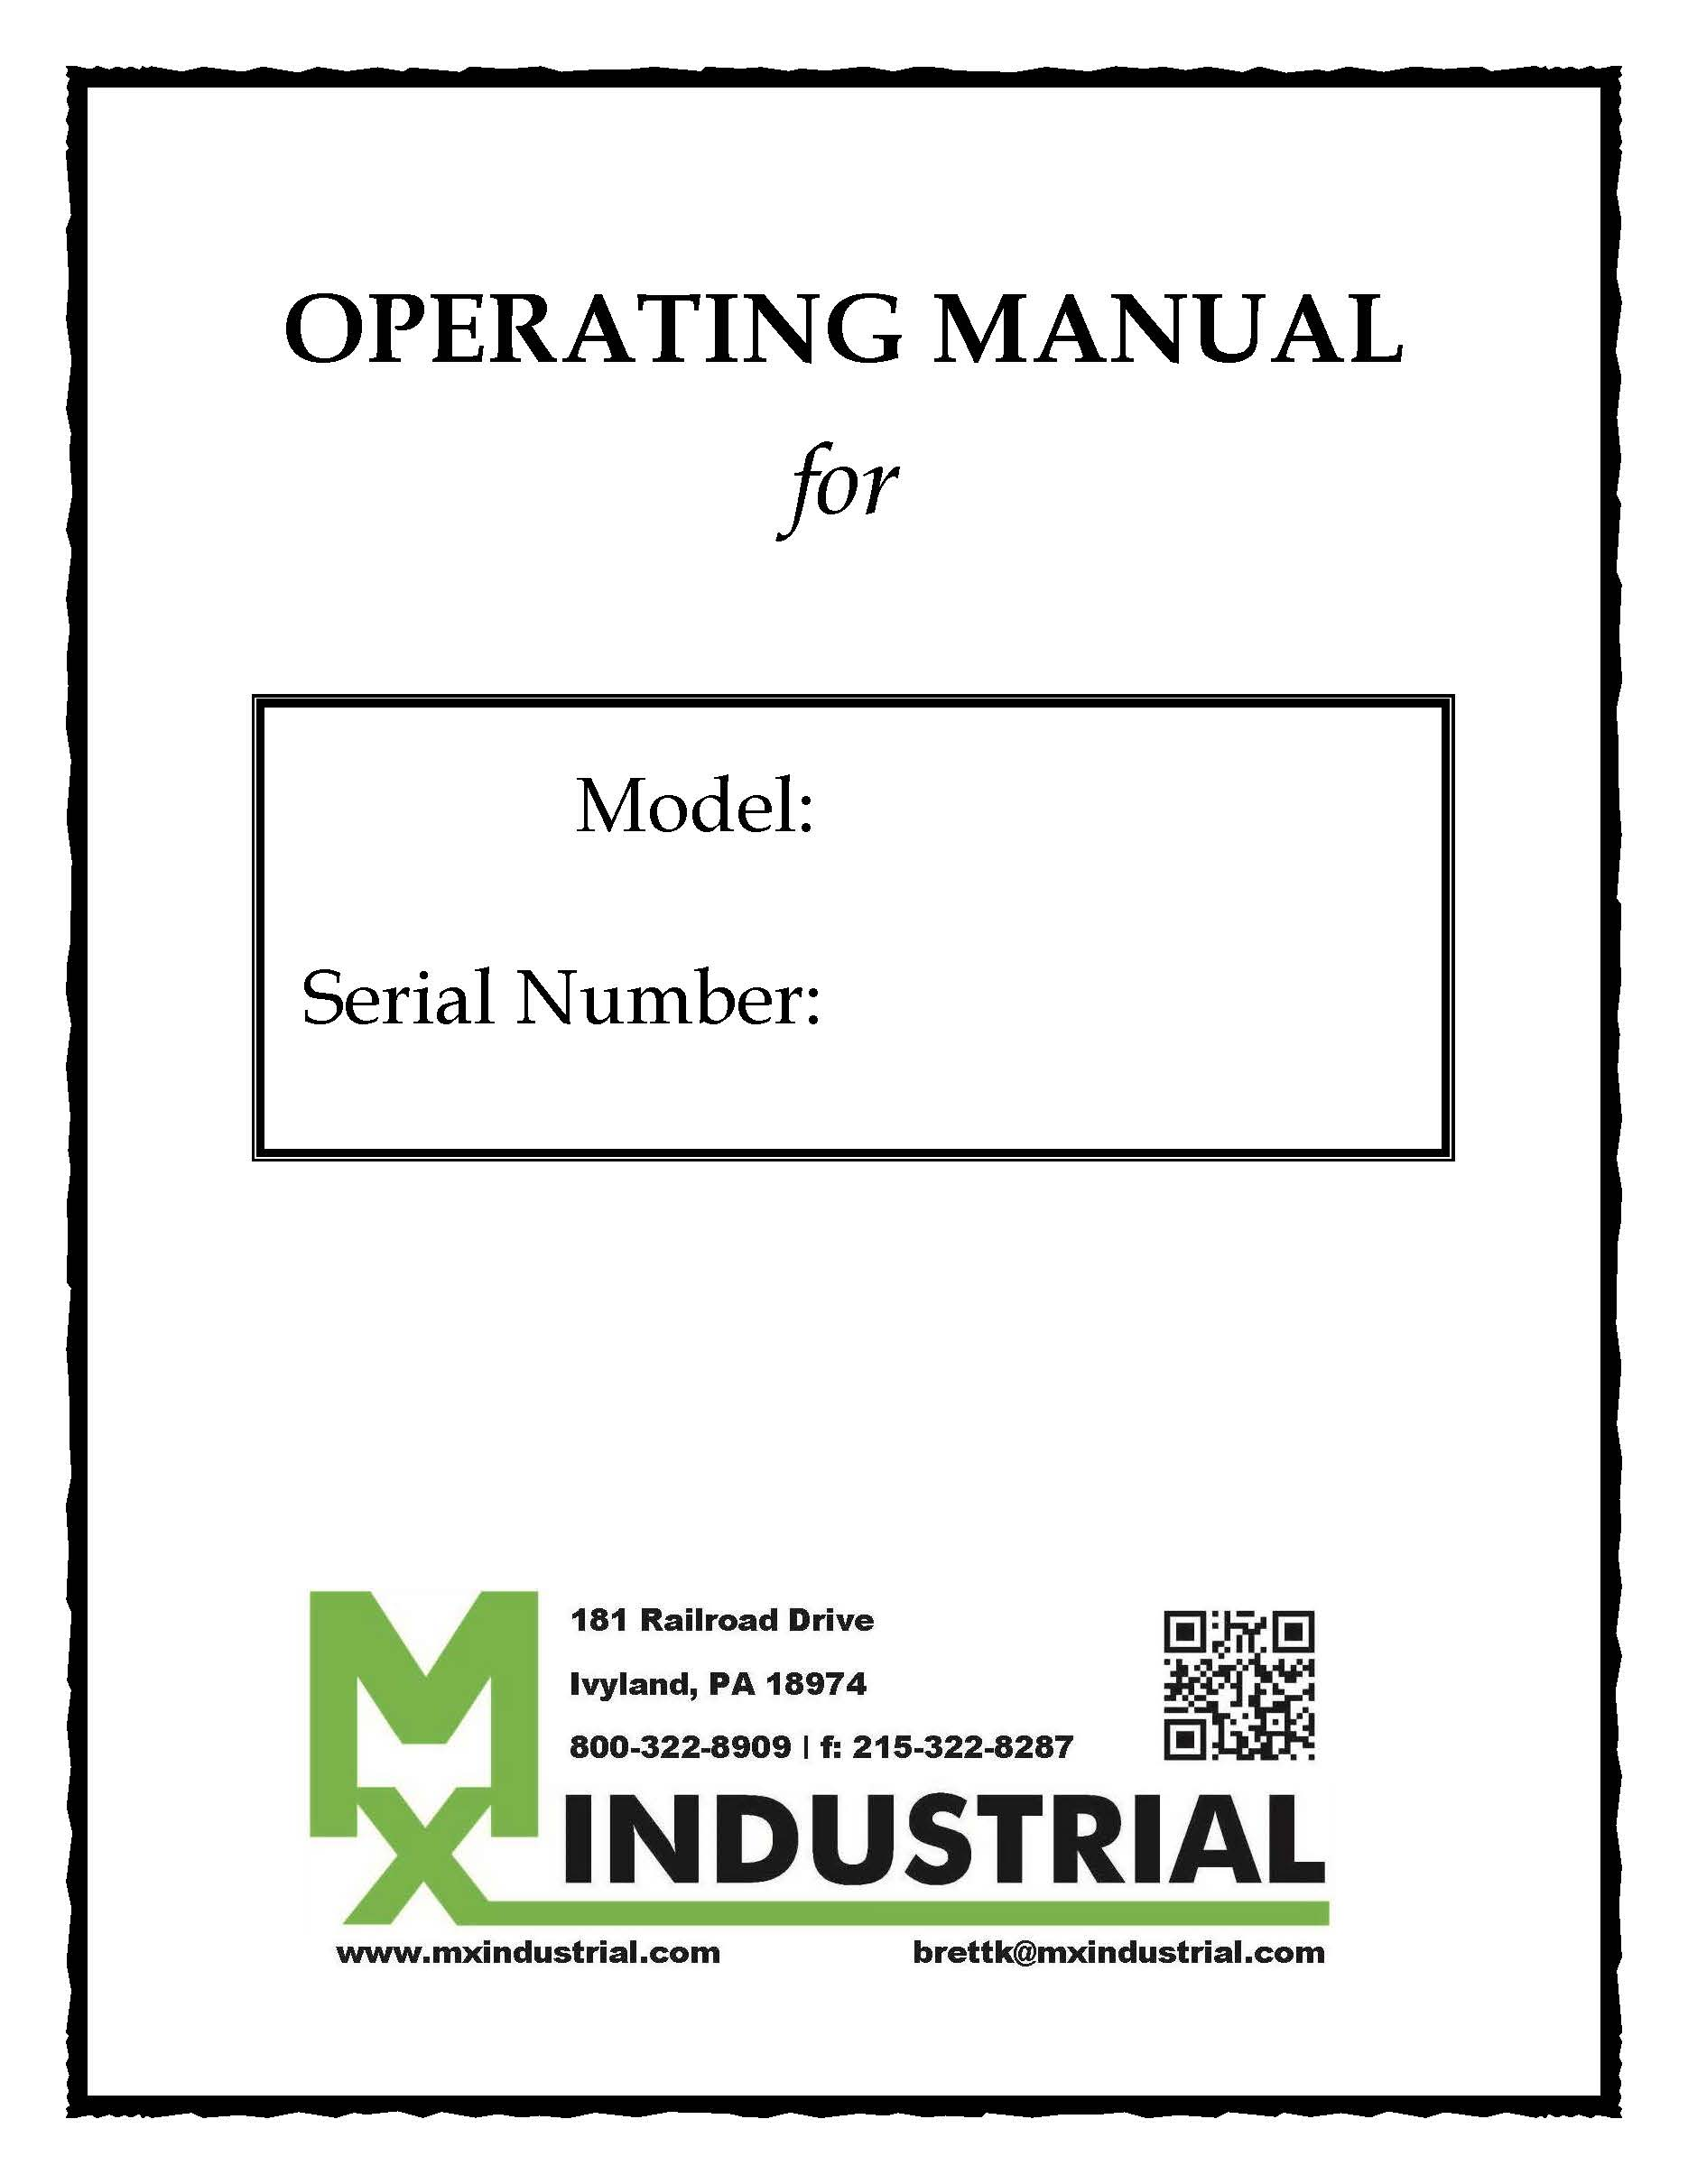 Equipment Manual – Hard Copy